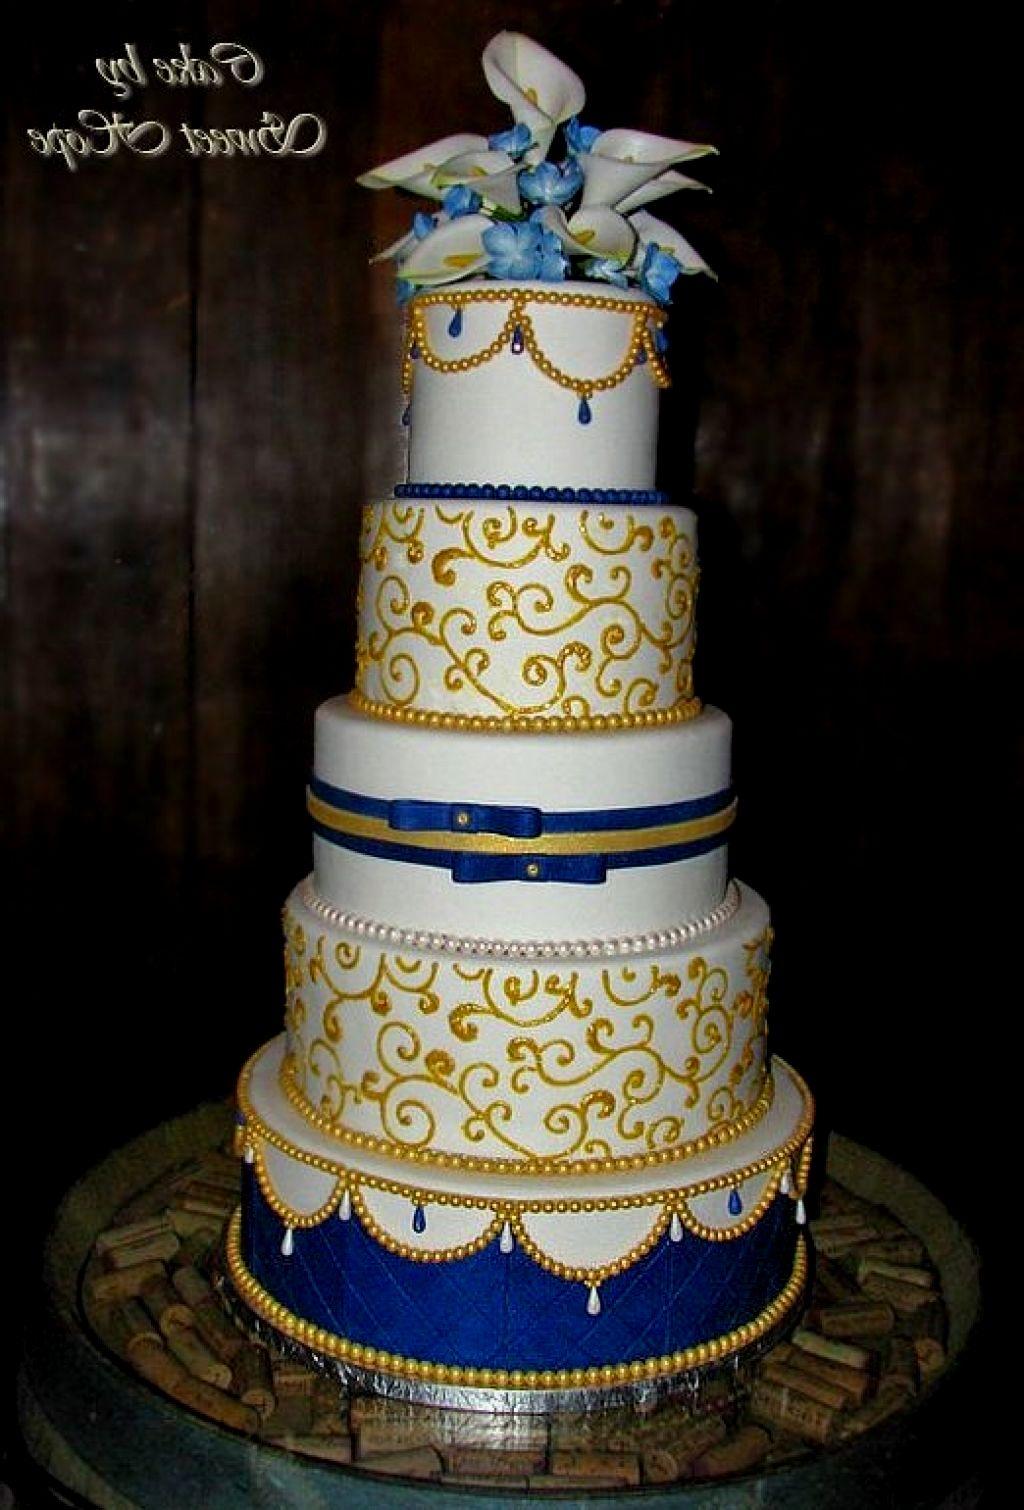 12 Royal Gold Cakes Photo Blue And Gold Wedding Cake Royal Blue